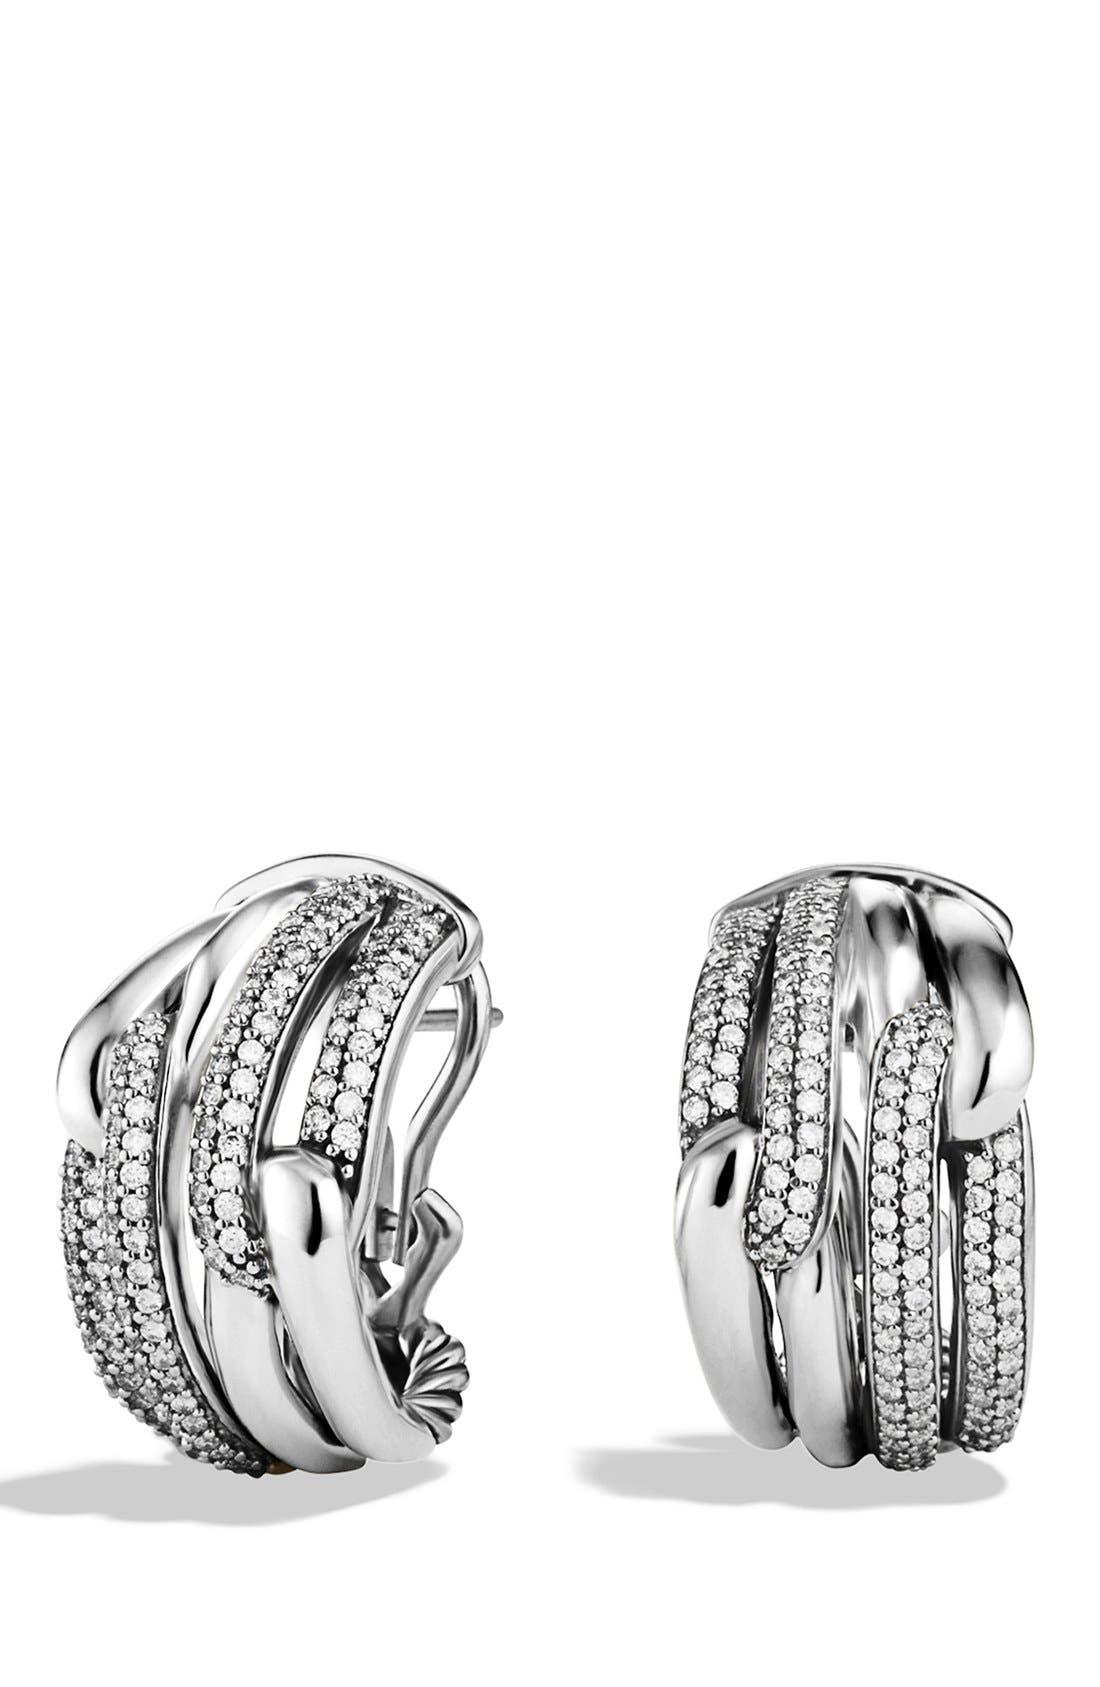 Alternate Image 1 Selected - David Yurman 'Labyrinth' Double Loop Earrings with Diamonds